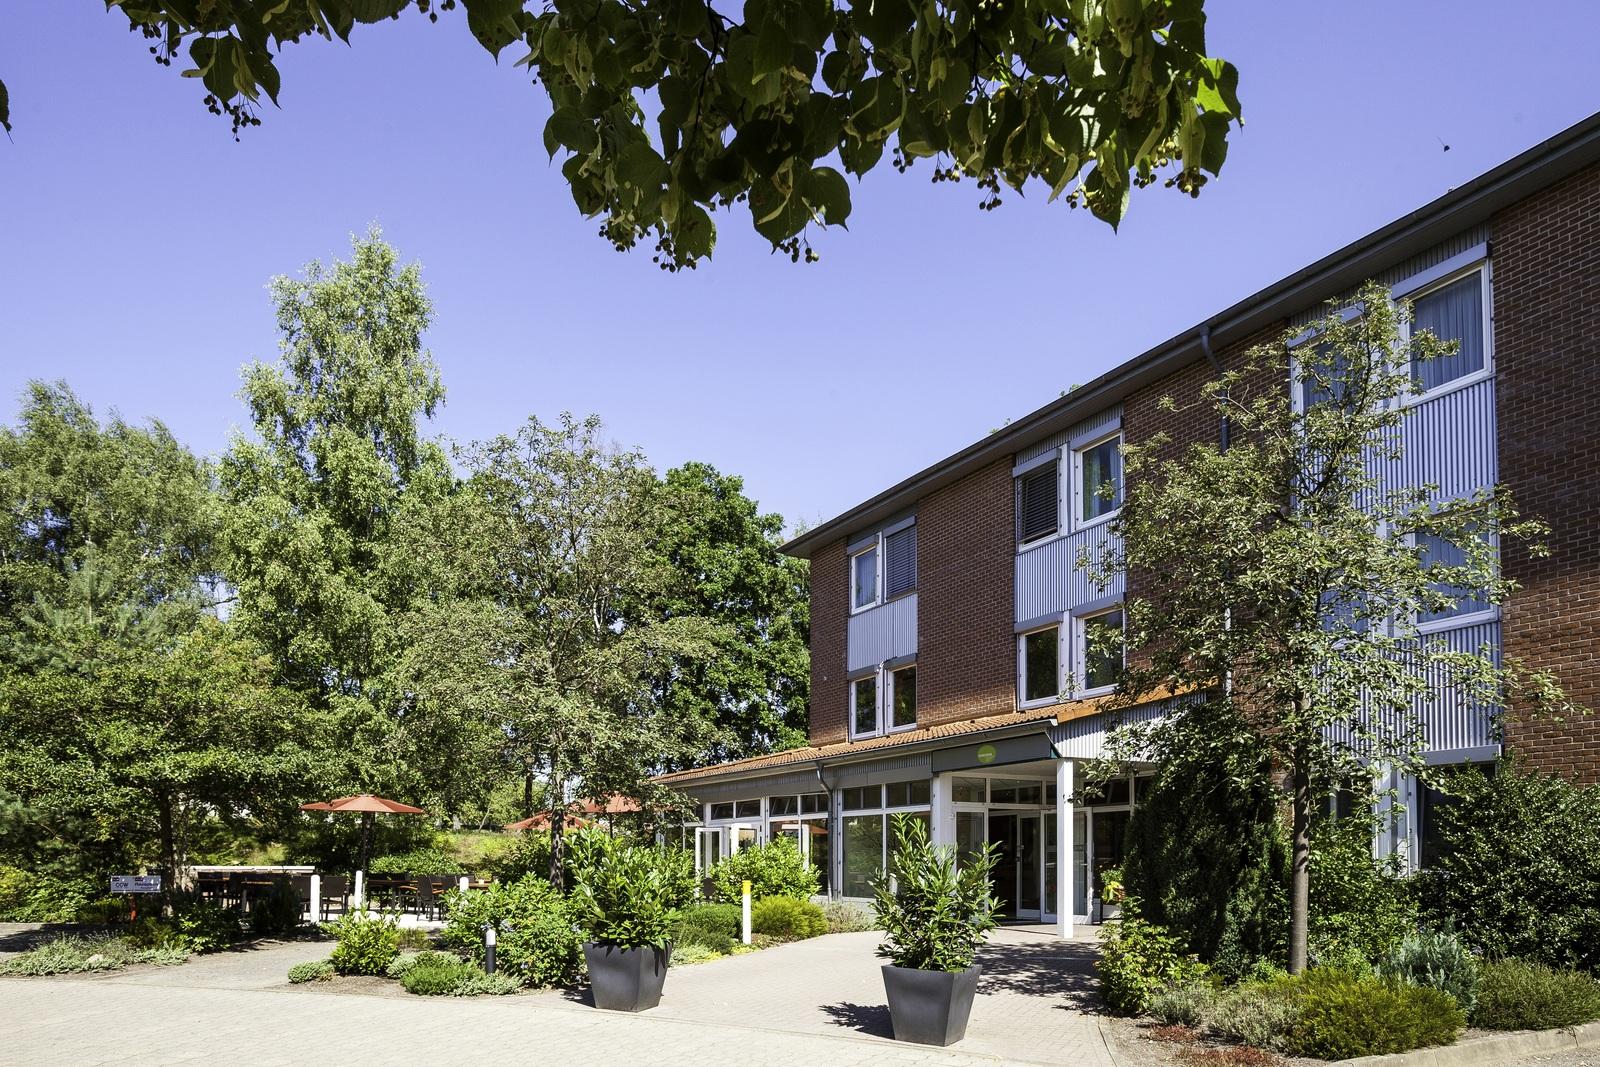 ANDERS Hotel Walsrode